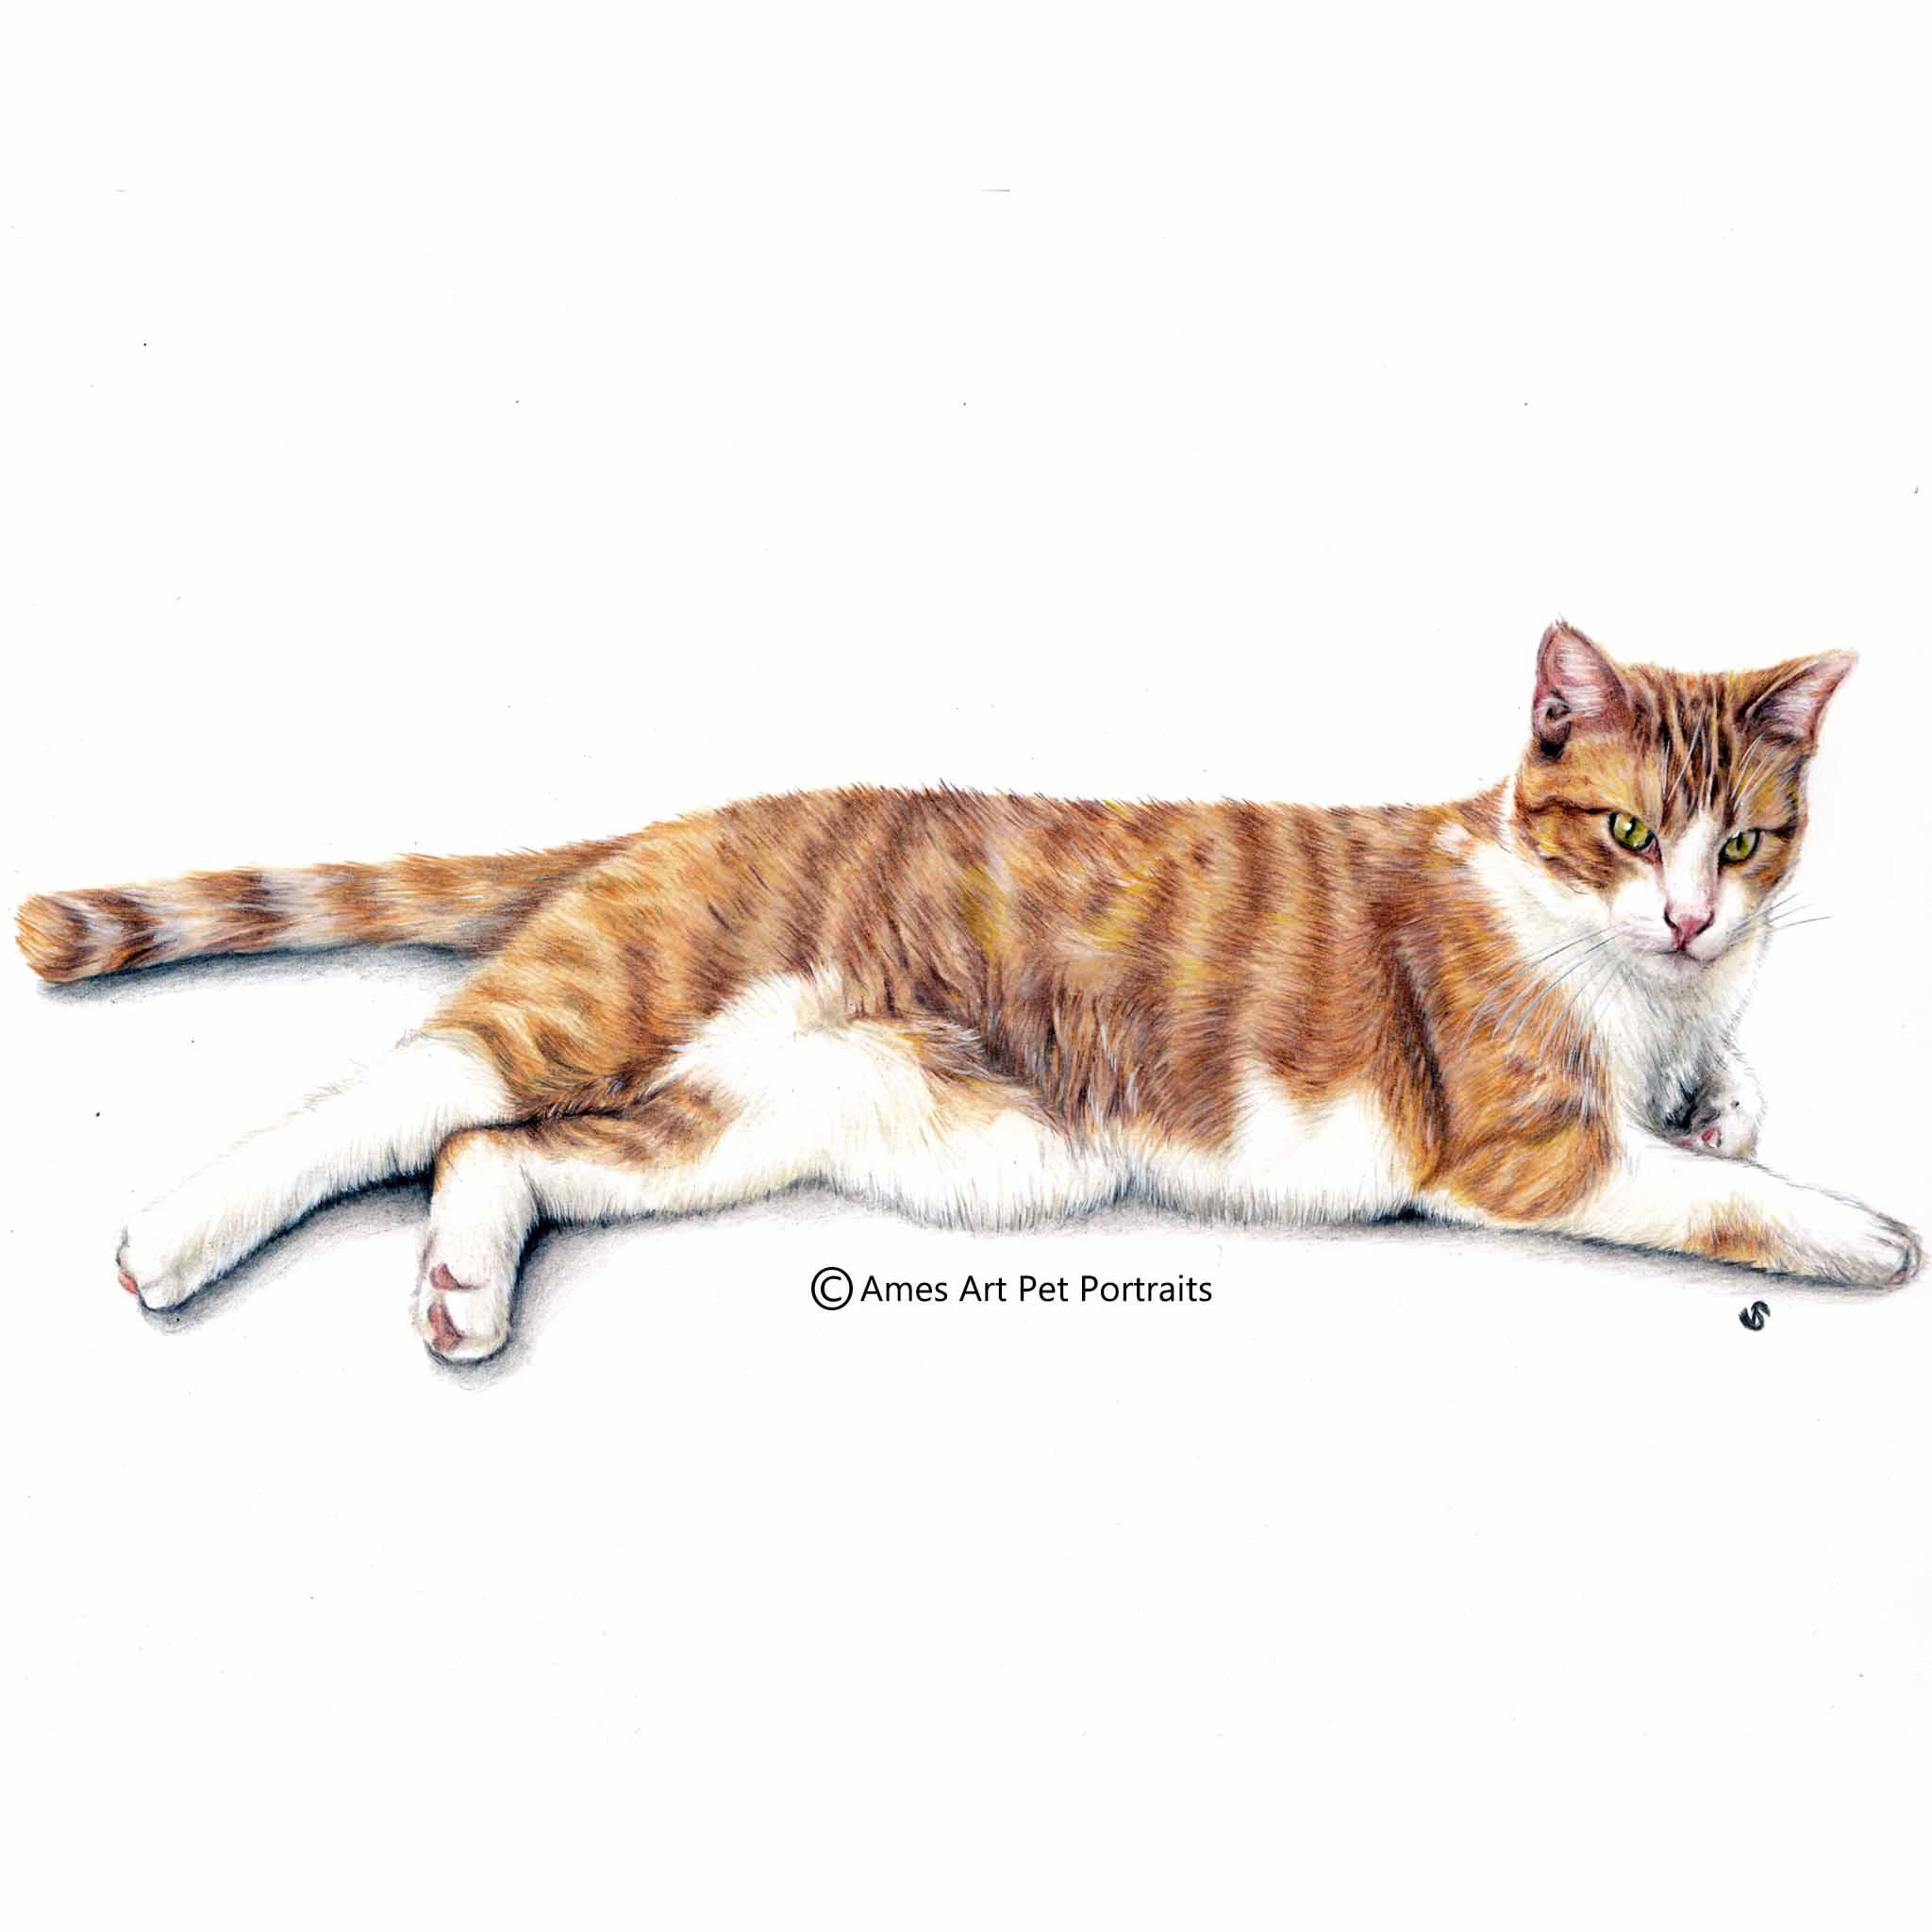 'Konani' - USA, 11.7 x 16.5 in, 2017, Color Pencil Cat Portrait